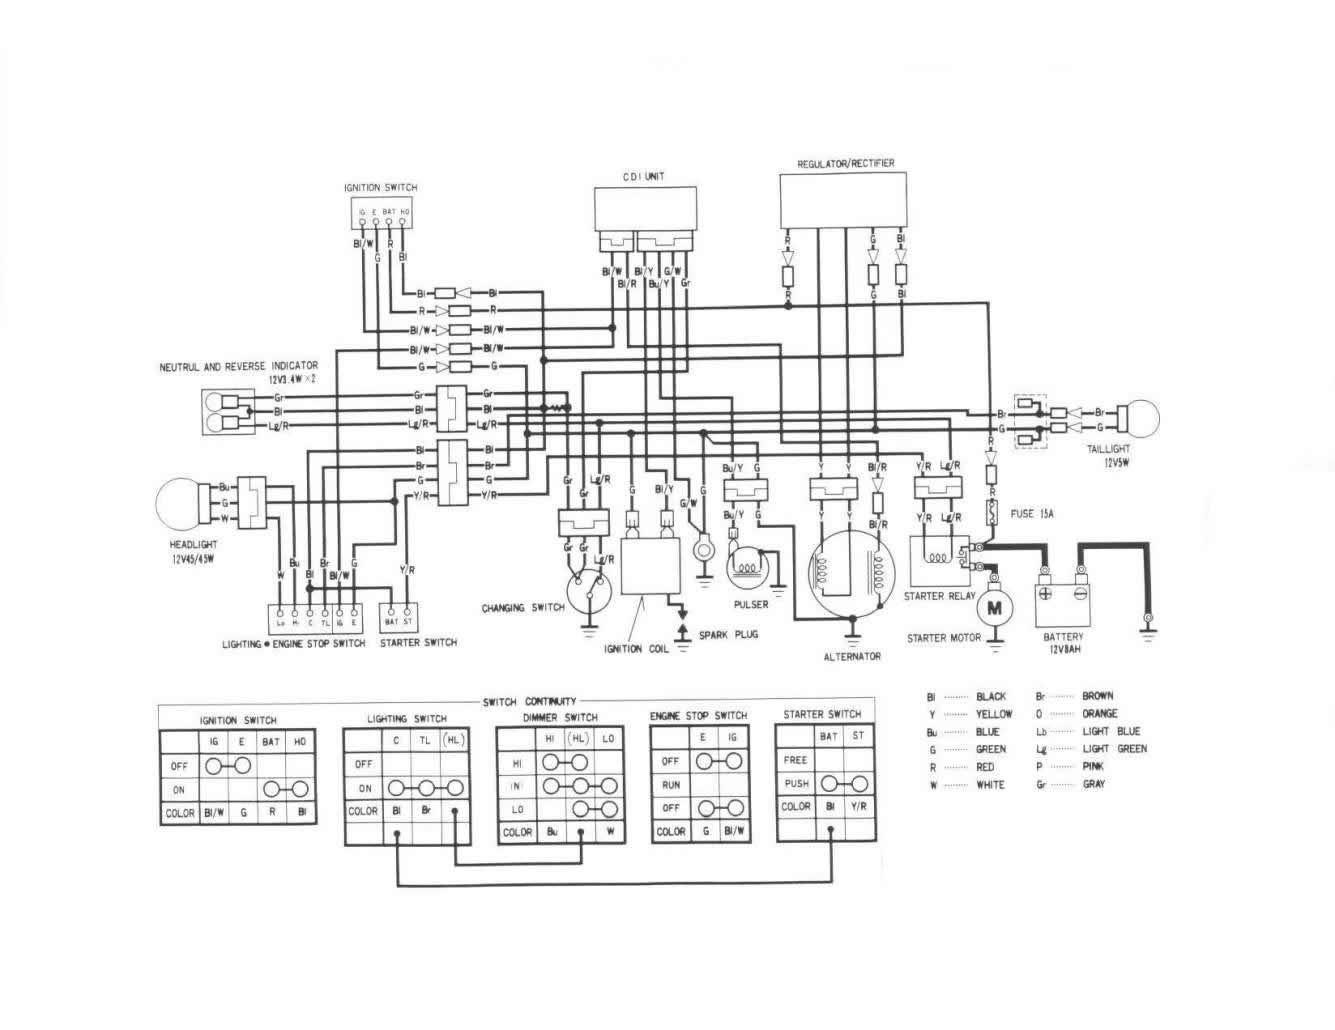 Kawasaki Bayou 300 Electrical Diagram  Somurich